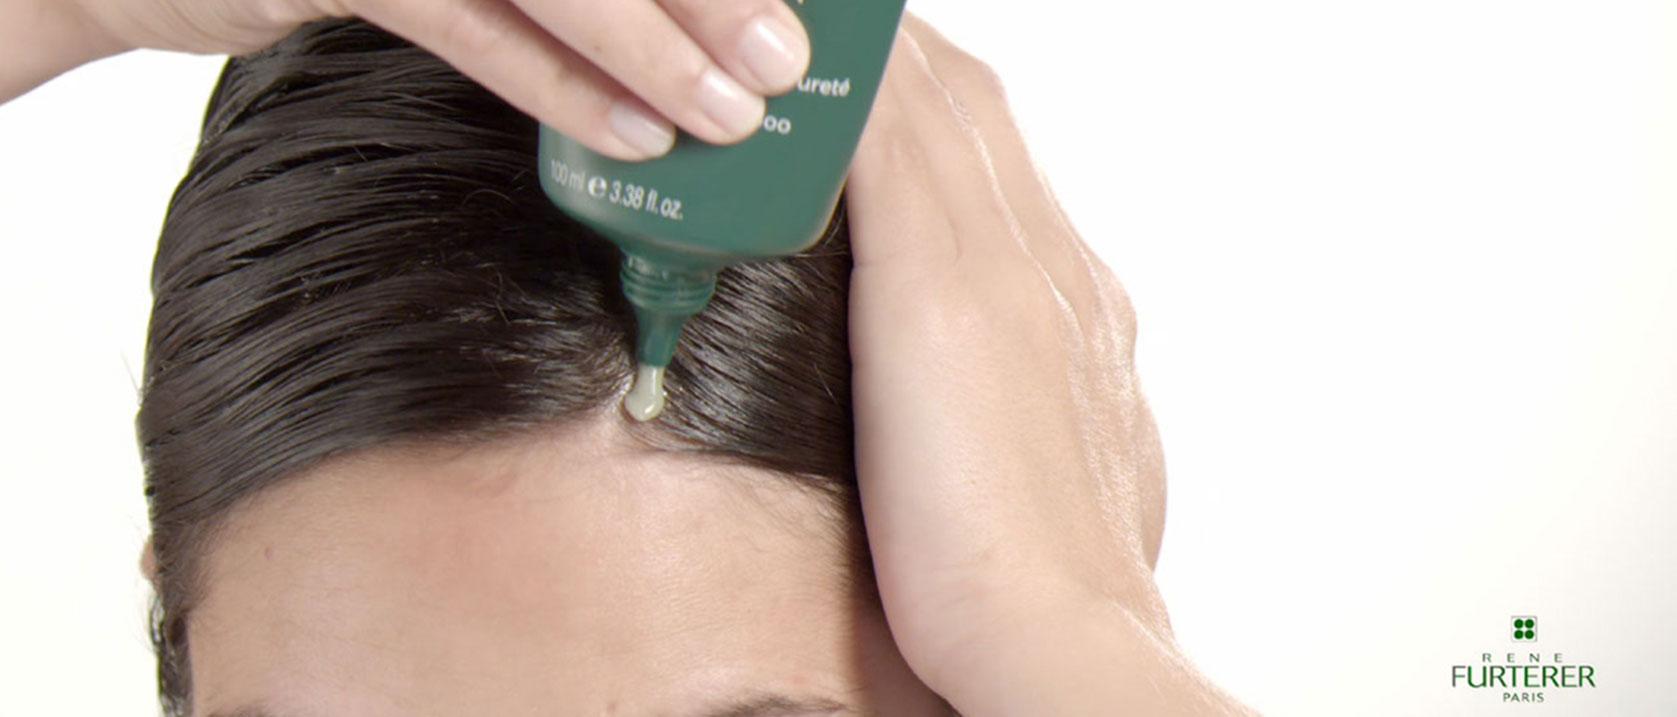 Cómo aplicar el champú-mascarilla Curbicia | René Furterer